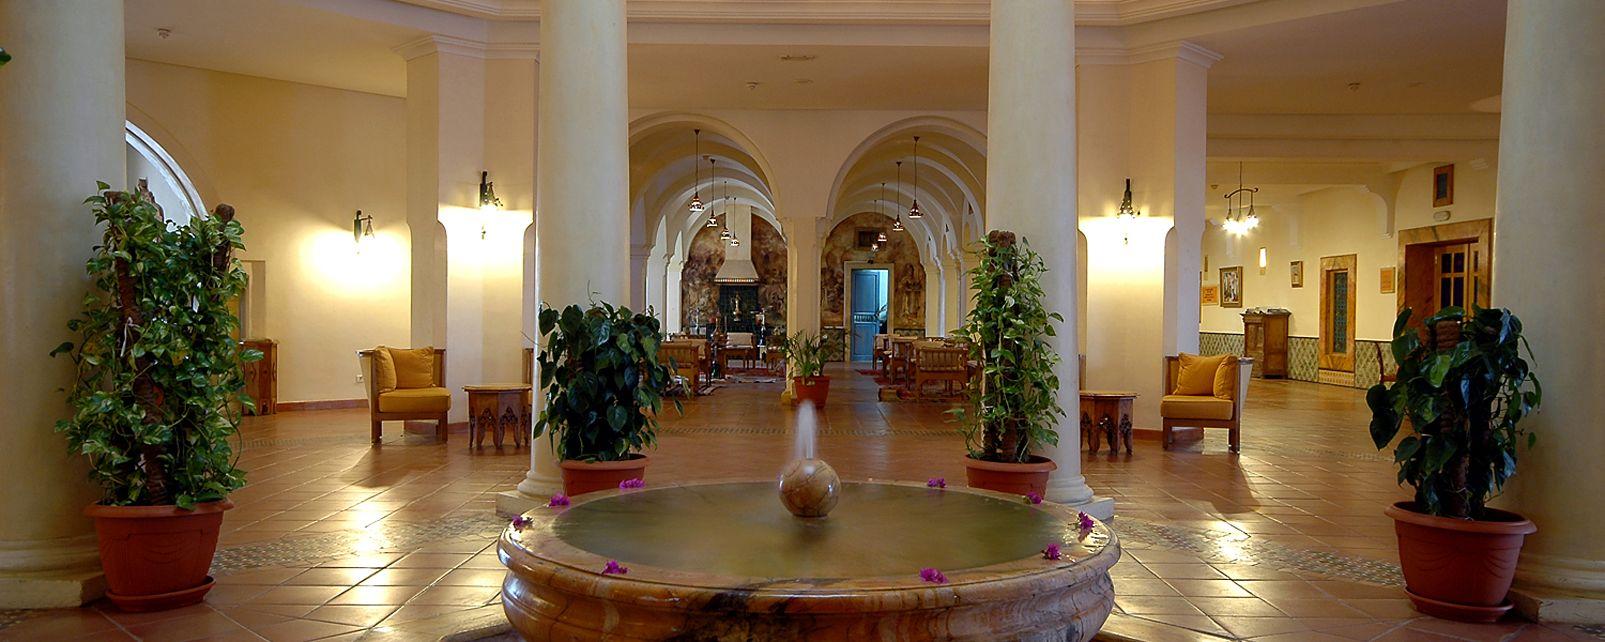 Hôtel Medina Belisaire Thalasso